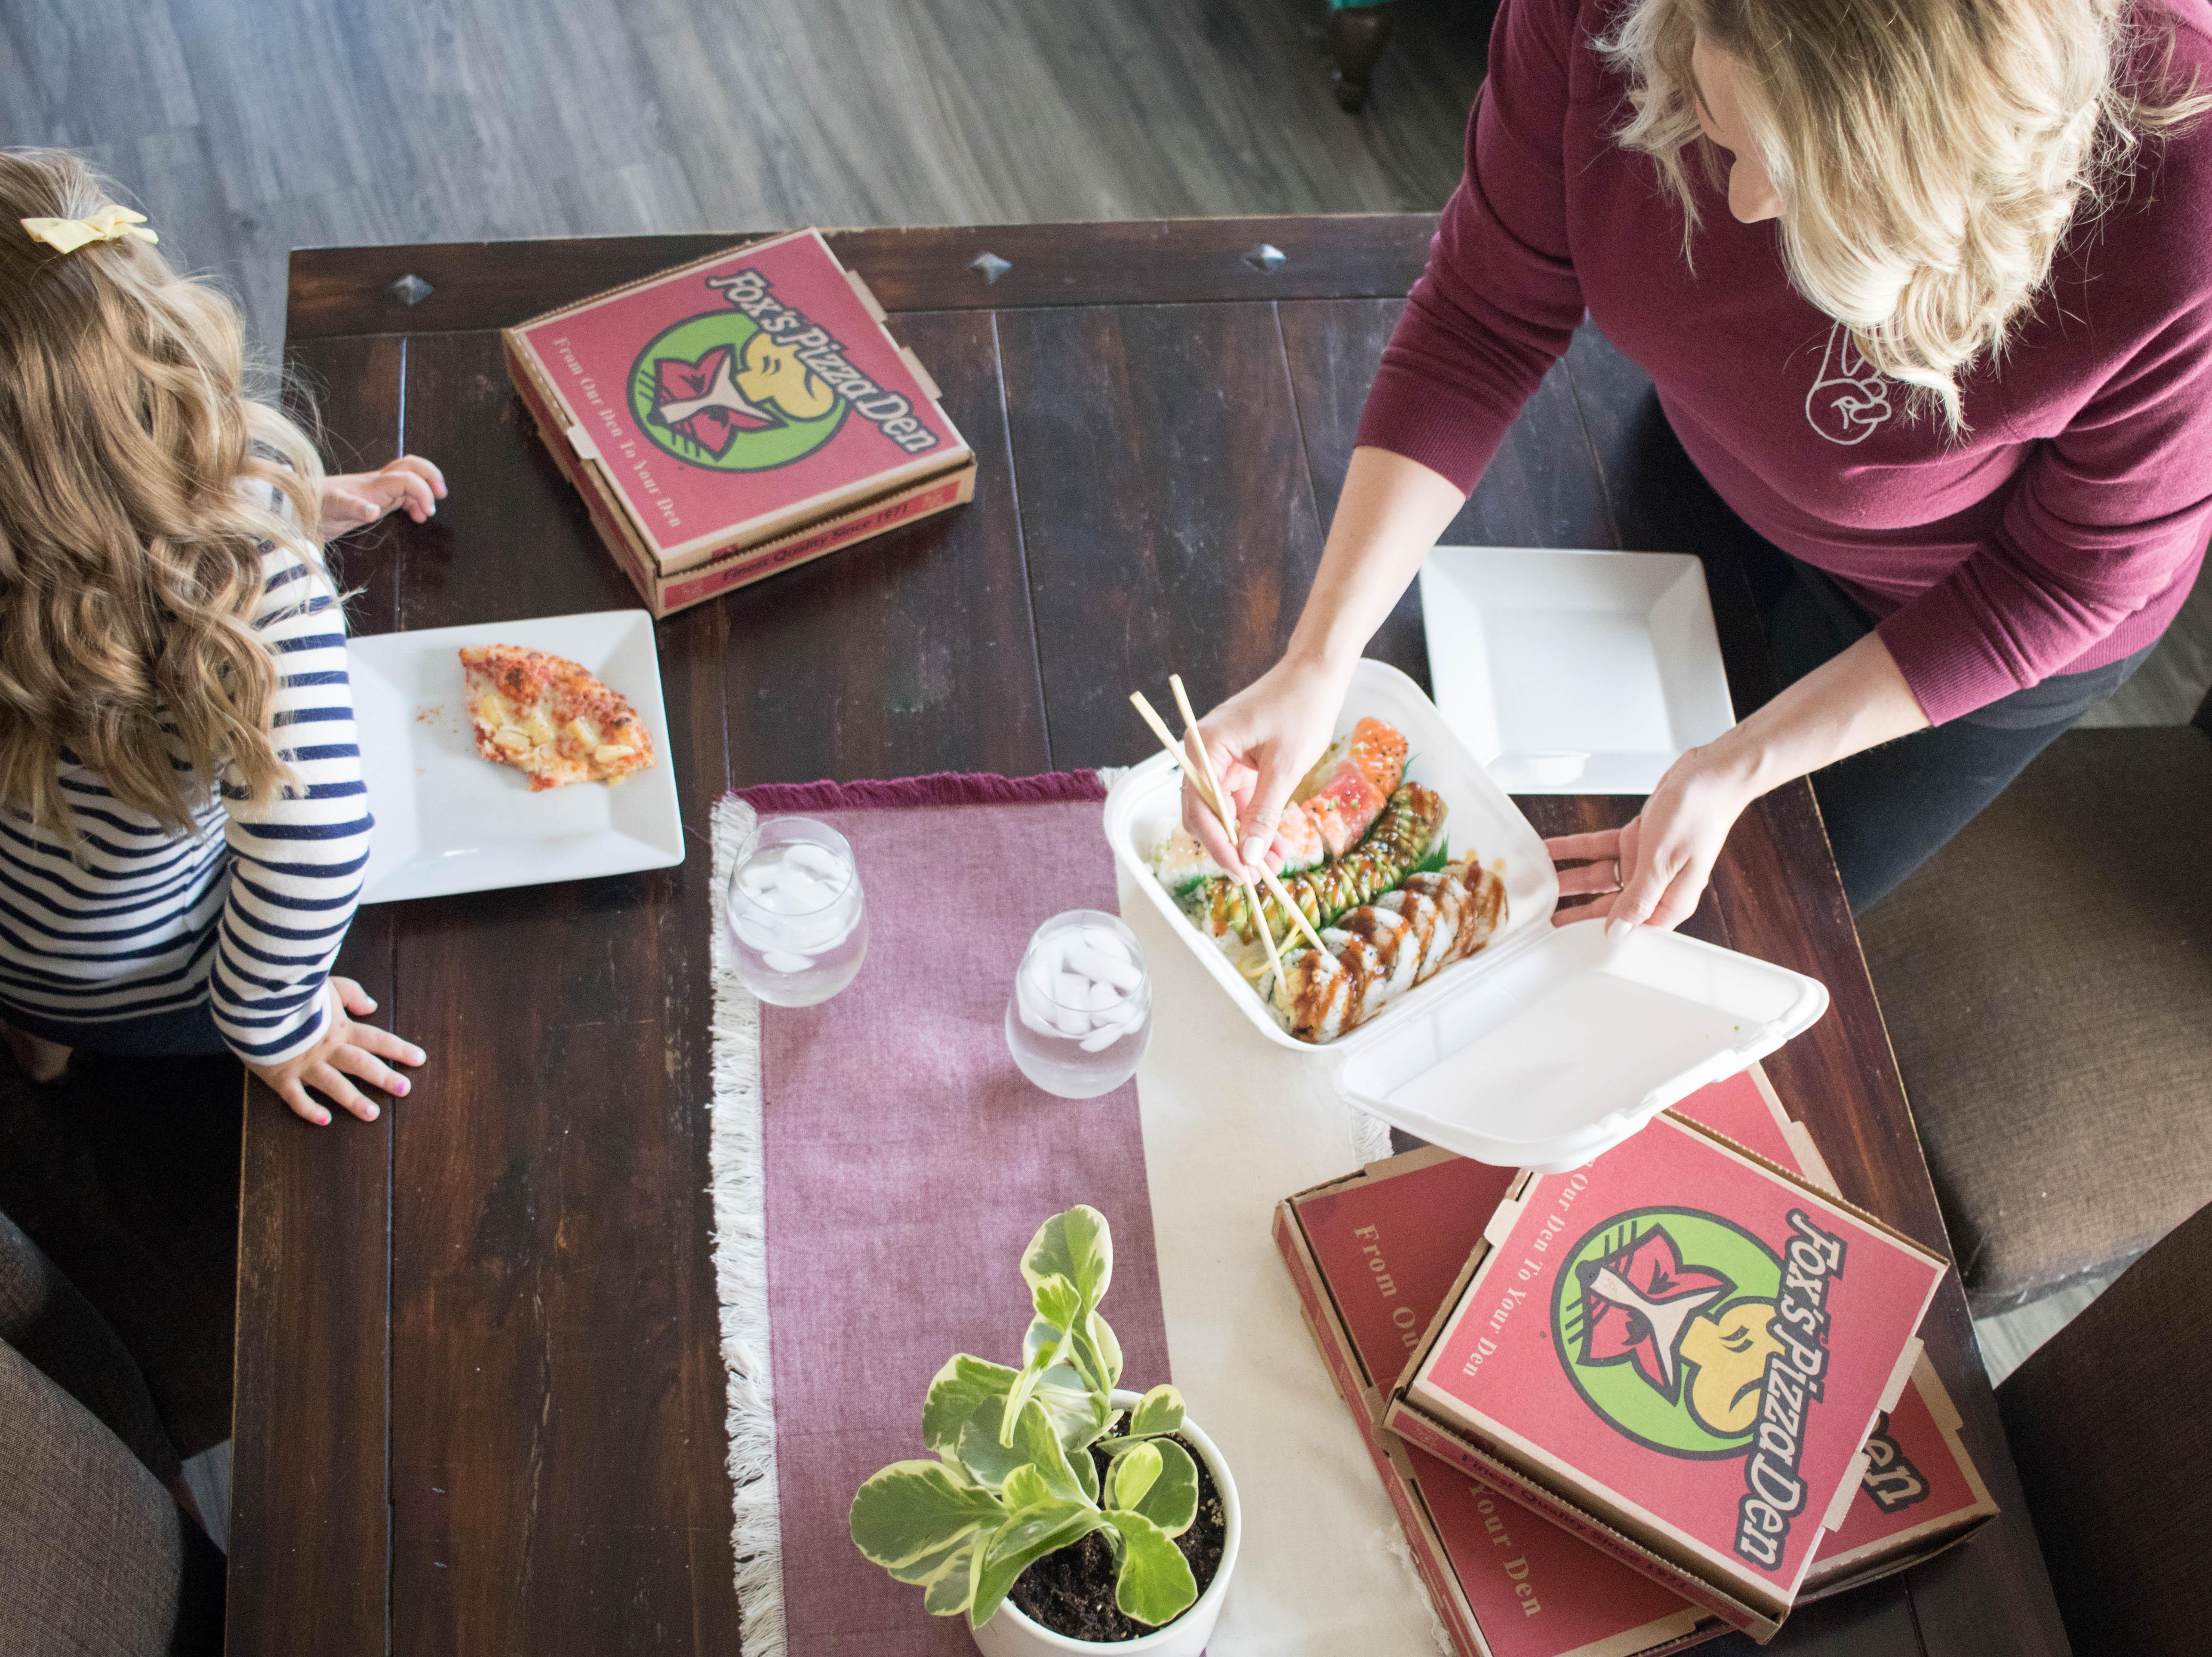 ordering in with grubhub girls night #dinnertime #grubhub #sushi #pizza